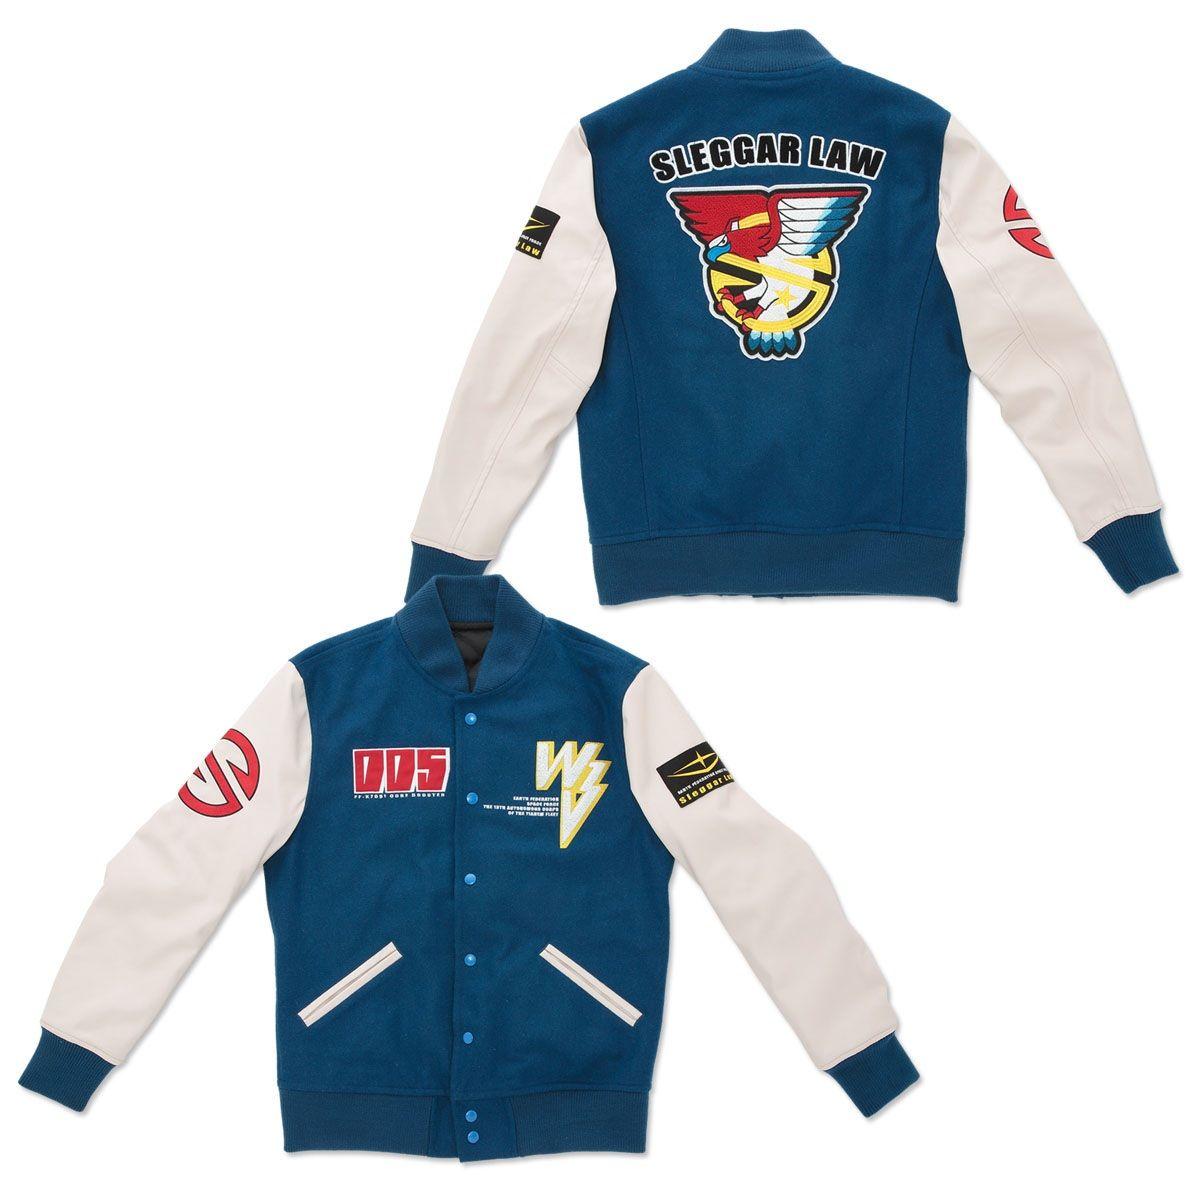 Mobile Suit Gundam Sleggar Law Personal Emblem Jacket